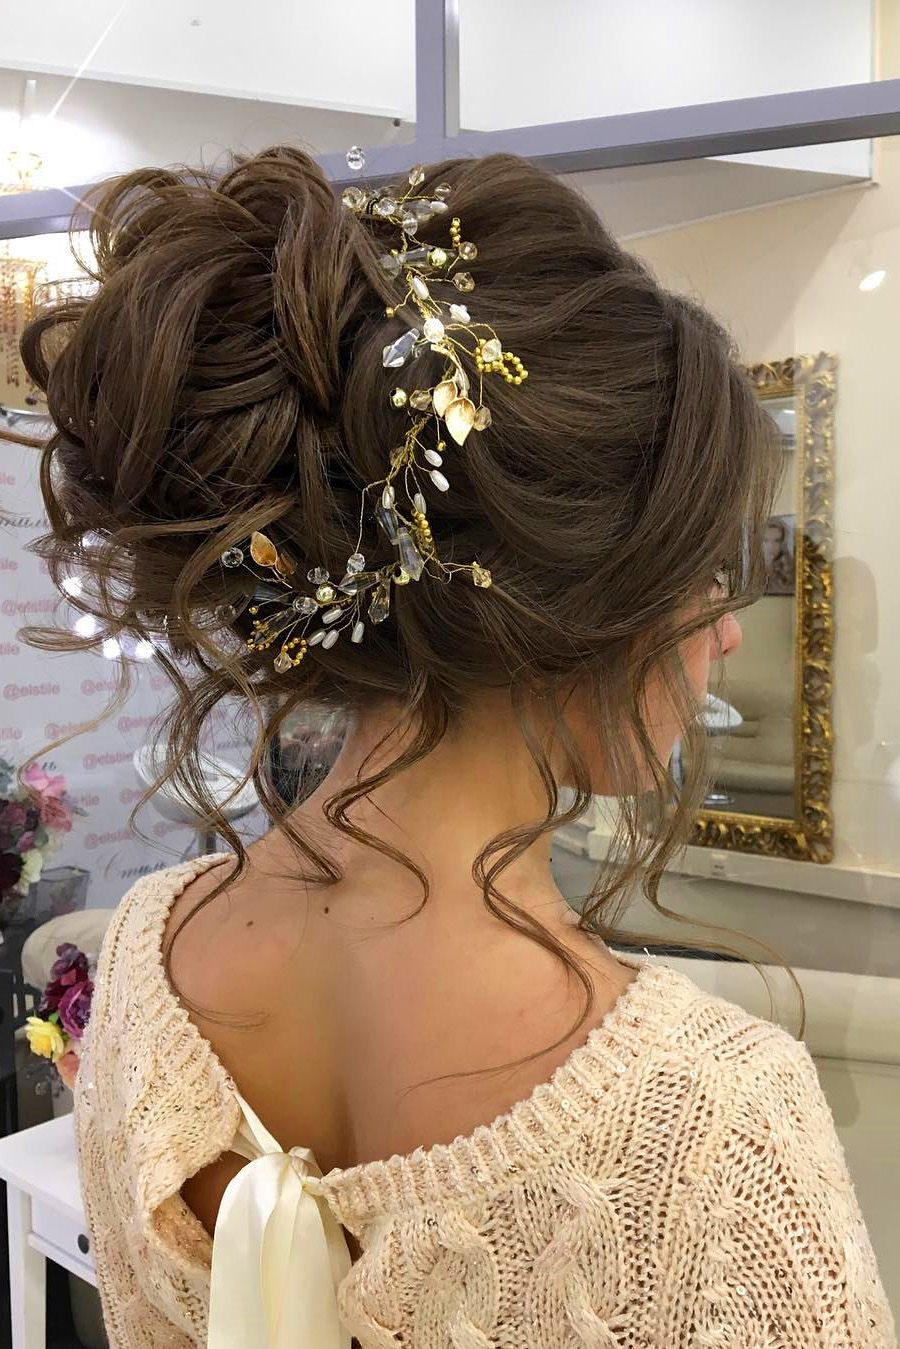 eyecatching wedding bun hairstyles weddings vintage bride